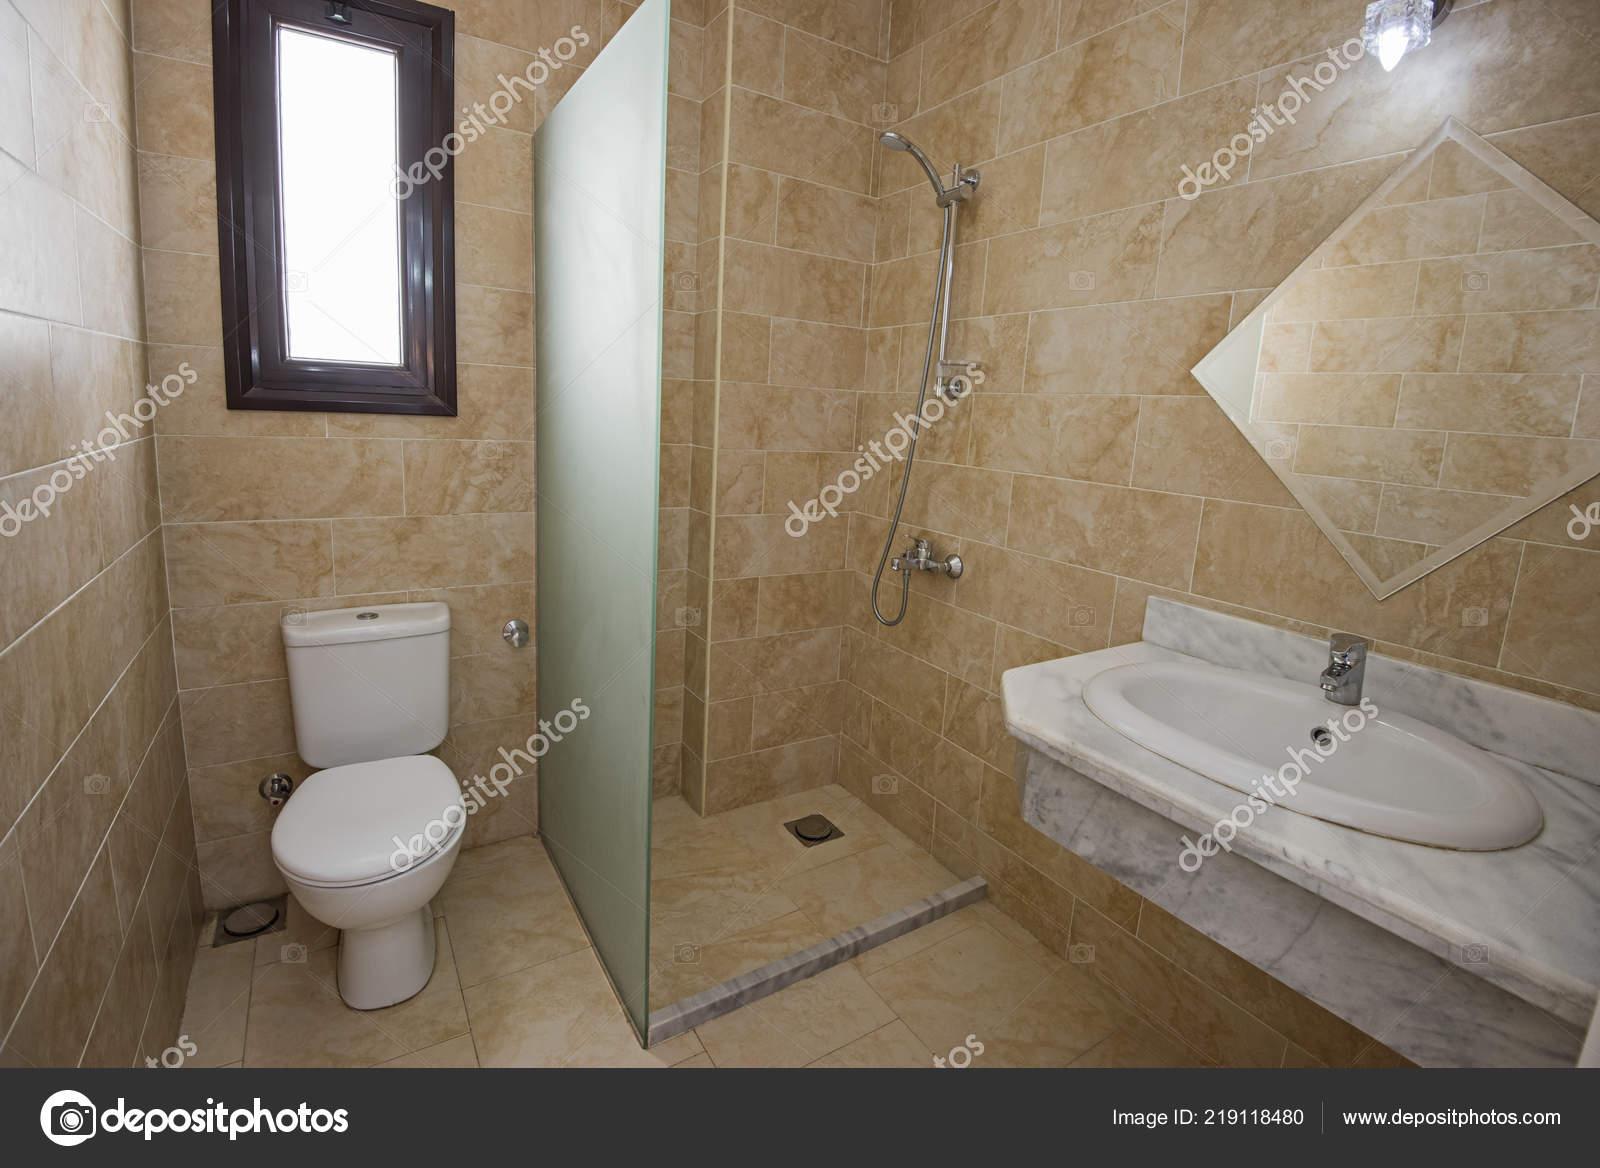 Cabine Salle De Bain Complete interior design luxury show home bathroom shower cubicle